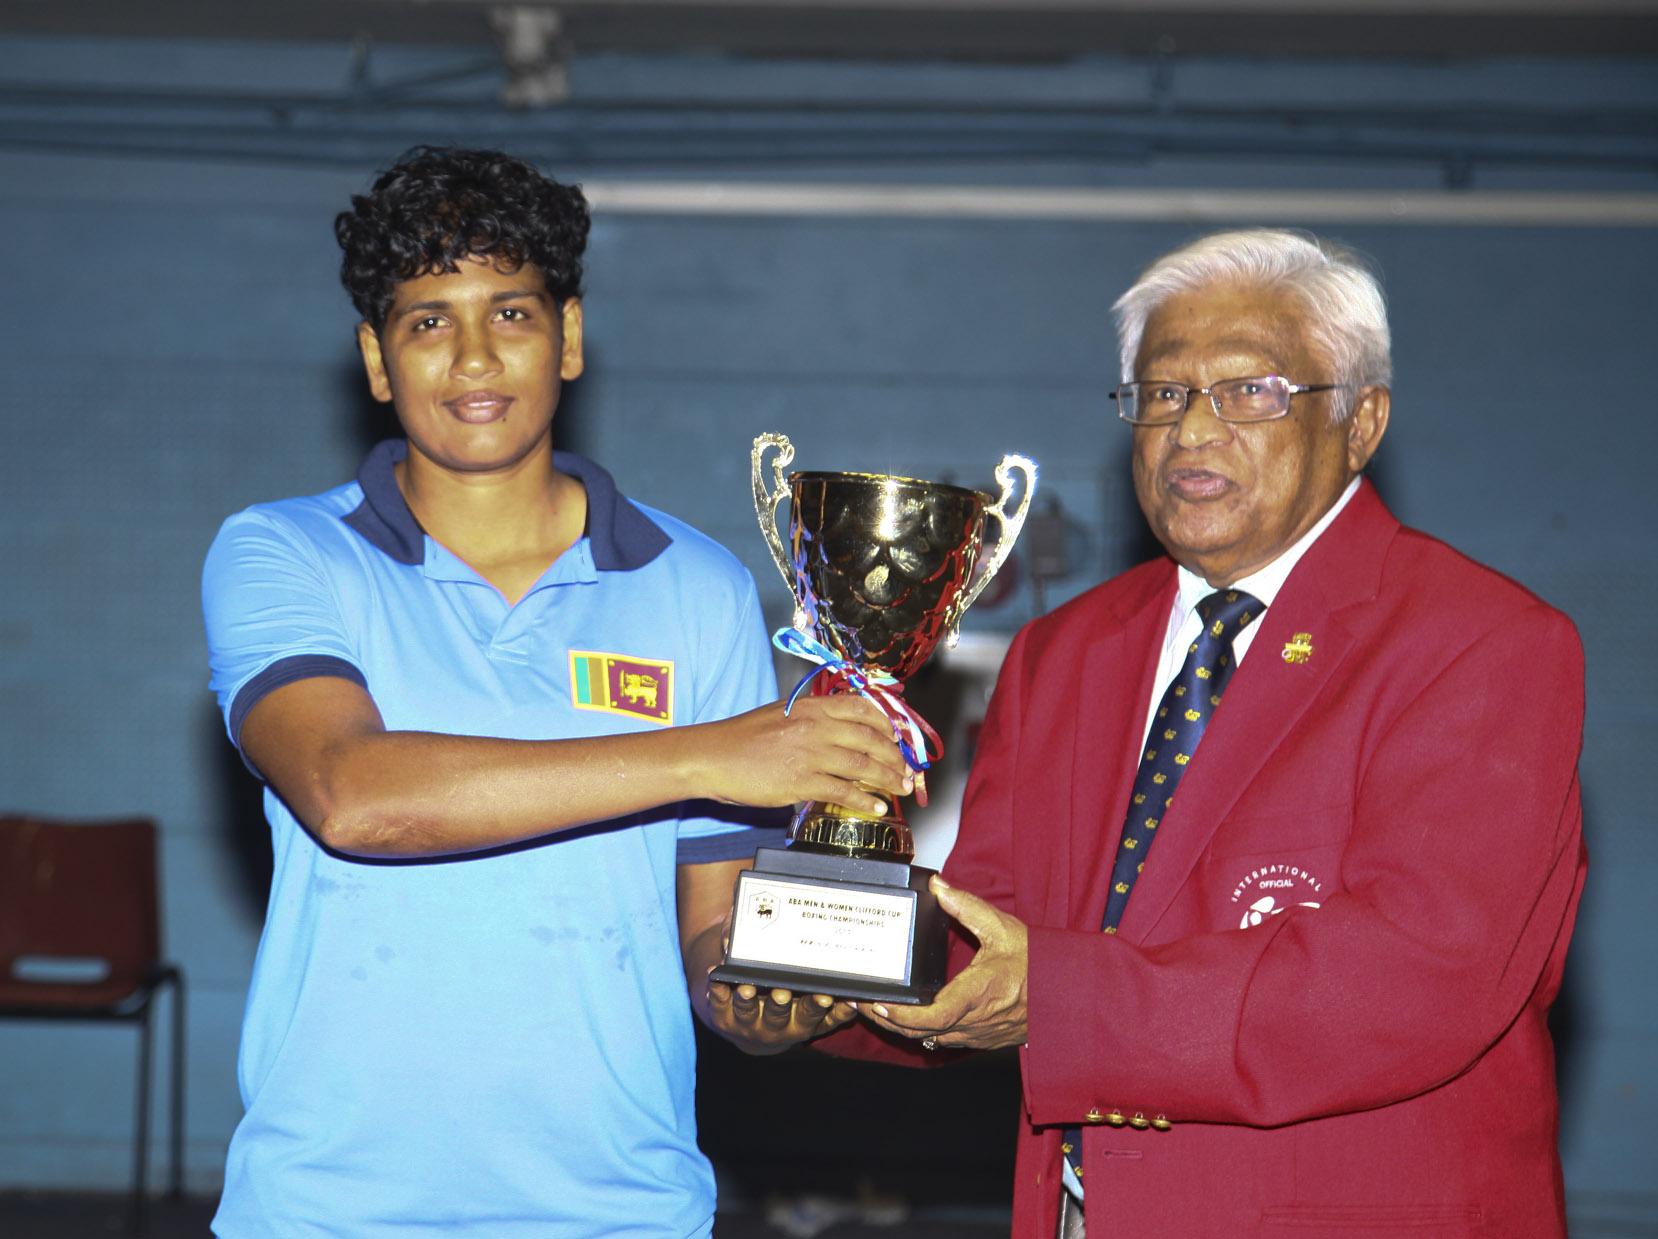 Clifford Cup - Best Boxer Niranjala Senanayake64Kg@Casuline